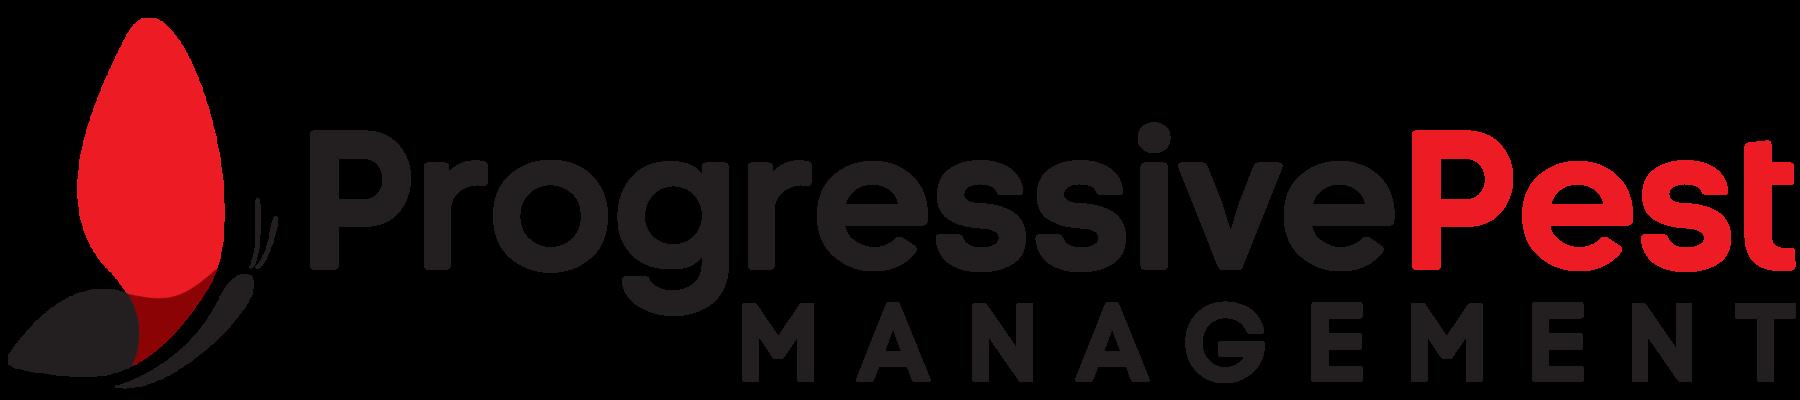 Progressive Pest Management